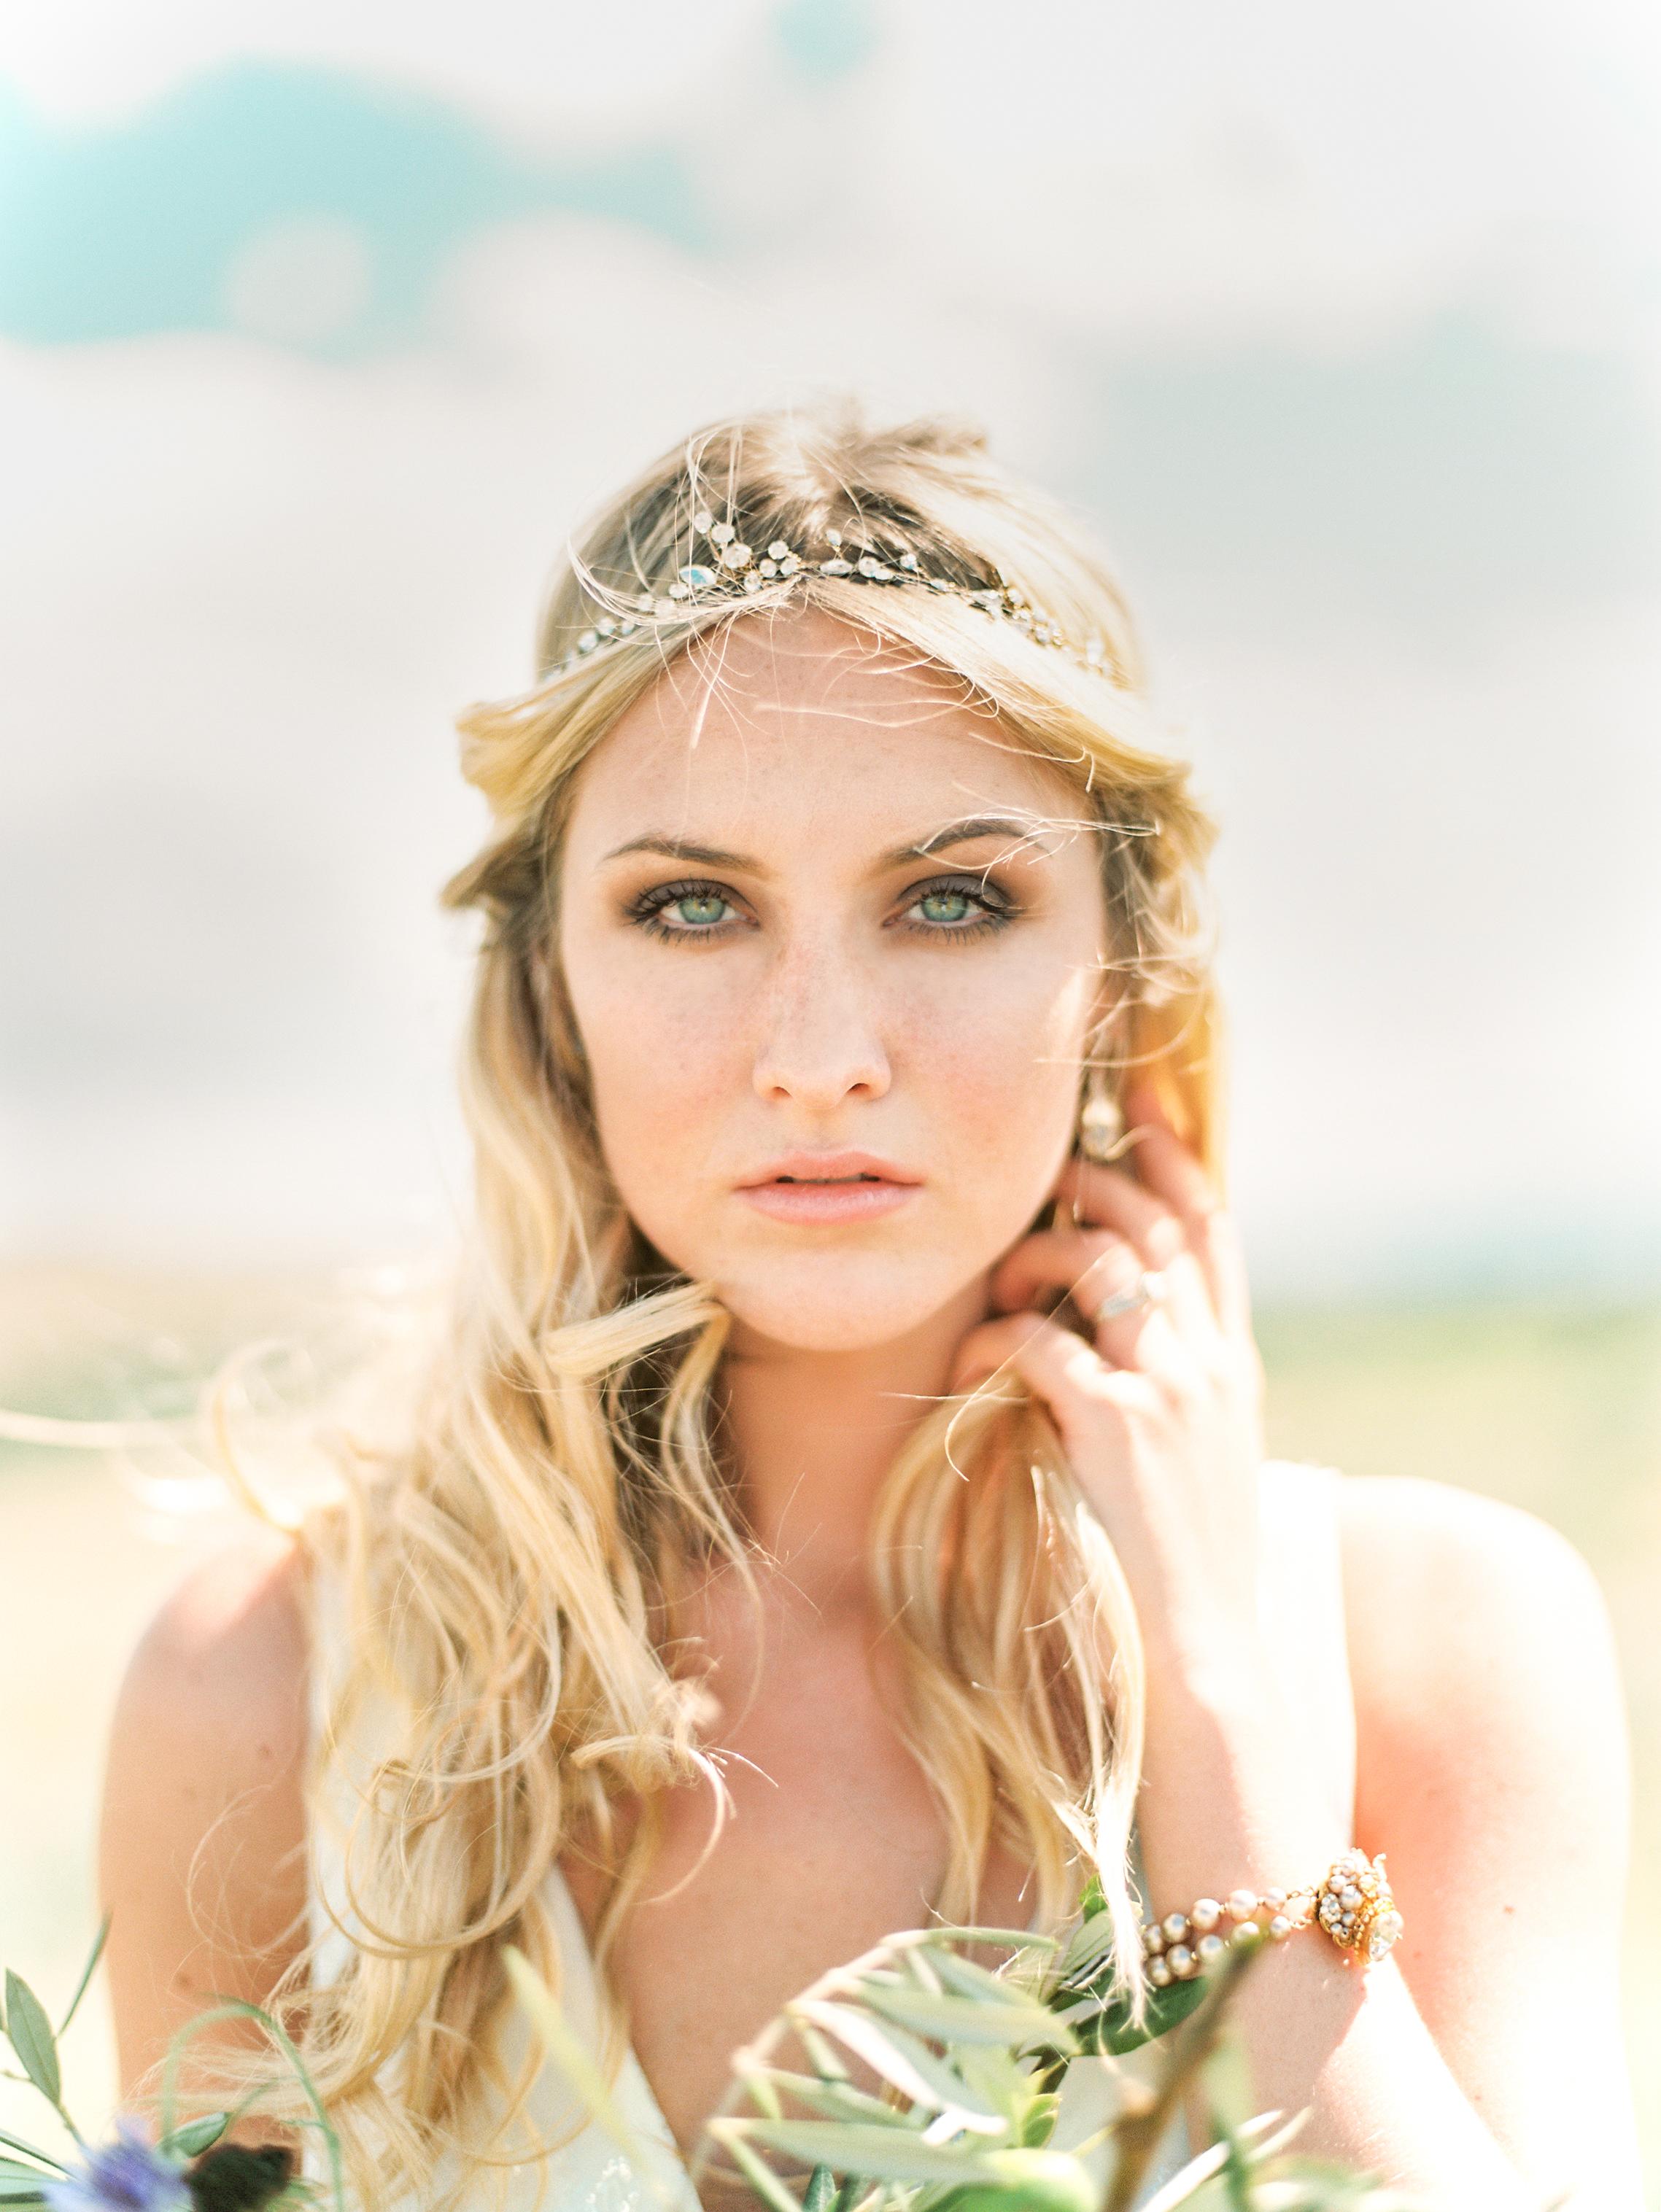 Bohemian Wedding Inspiration at Brush Creek Ranch | Twigs & Honey halo from Little White Dress Bridal Shop | Photography: Lisa O'Dwyer